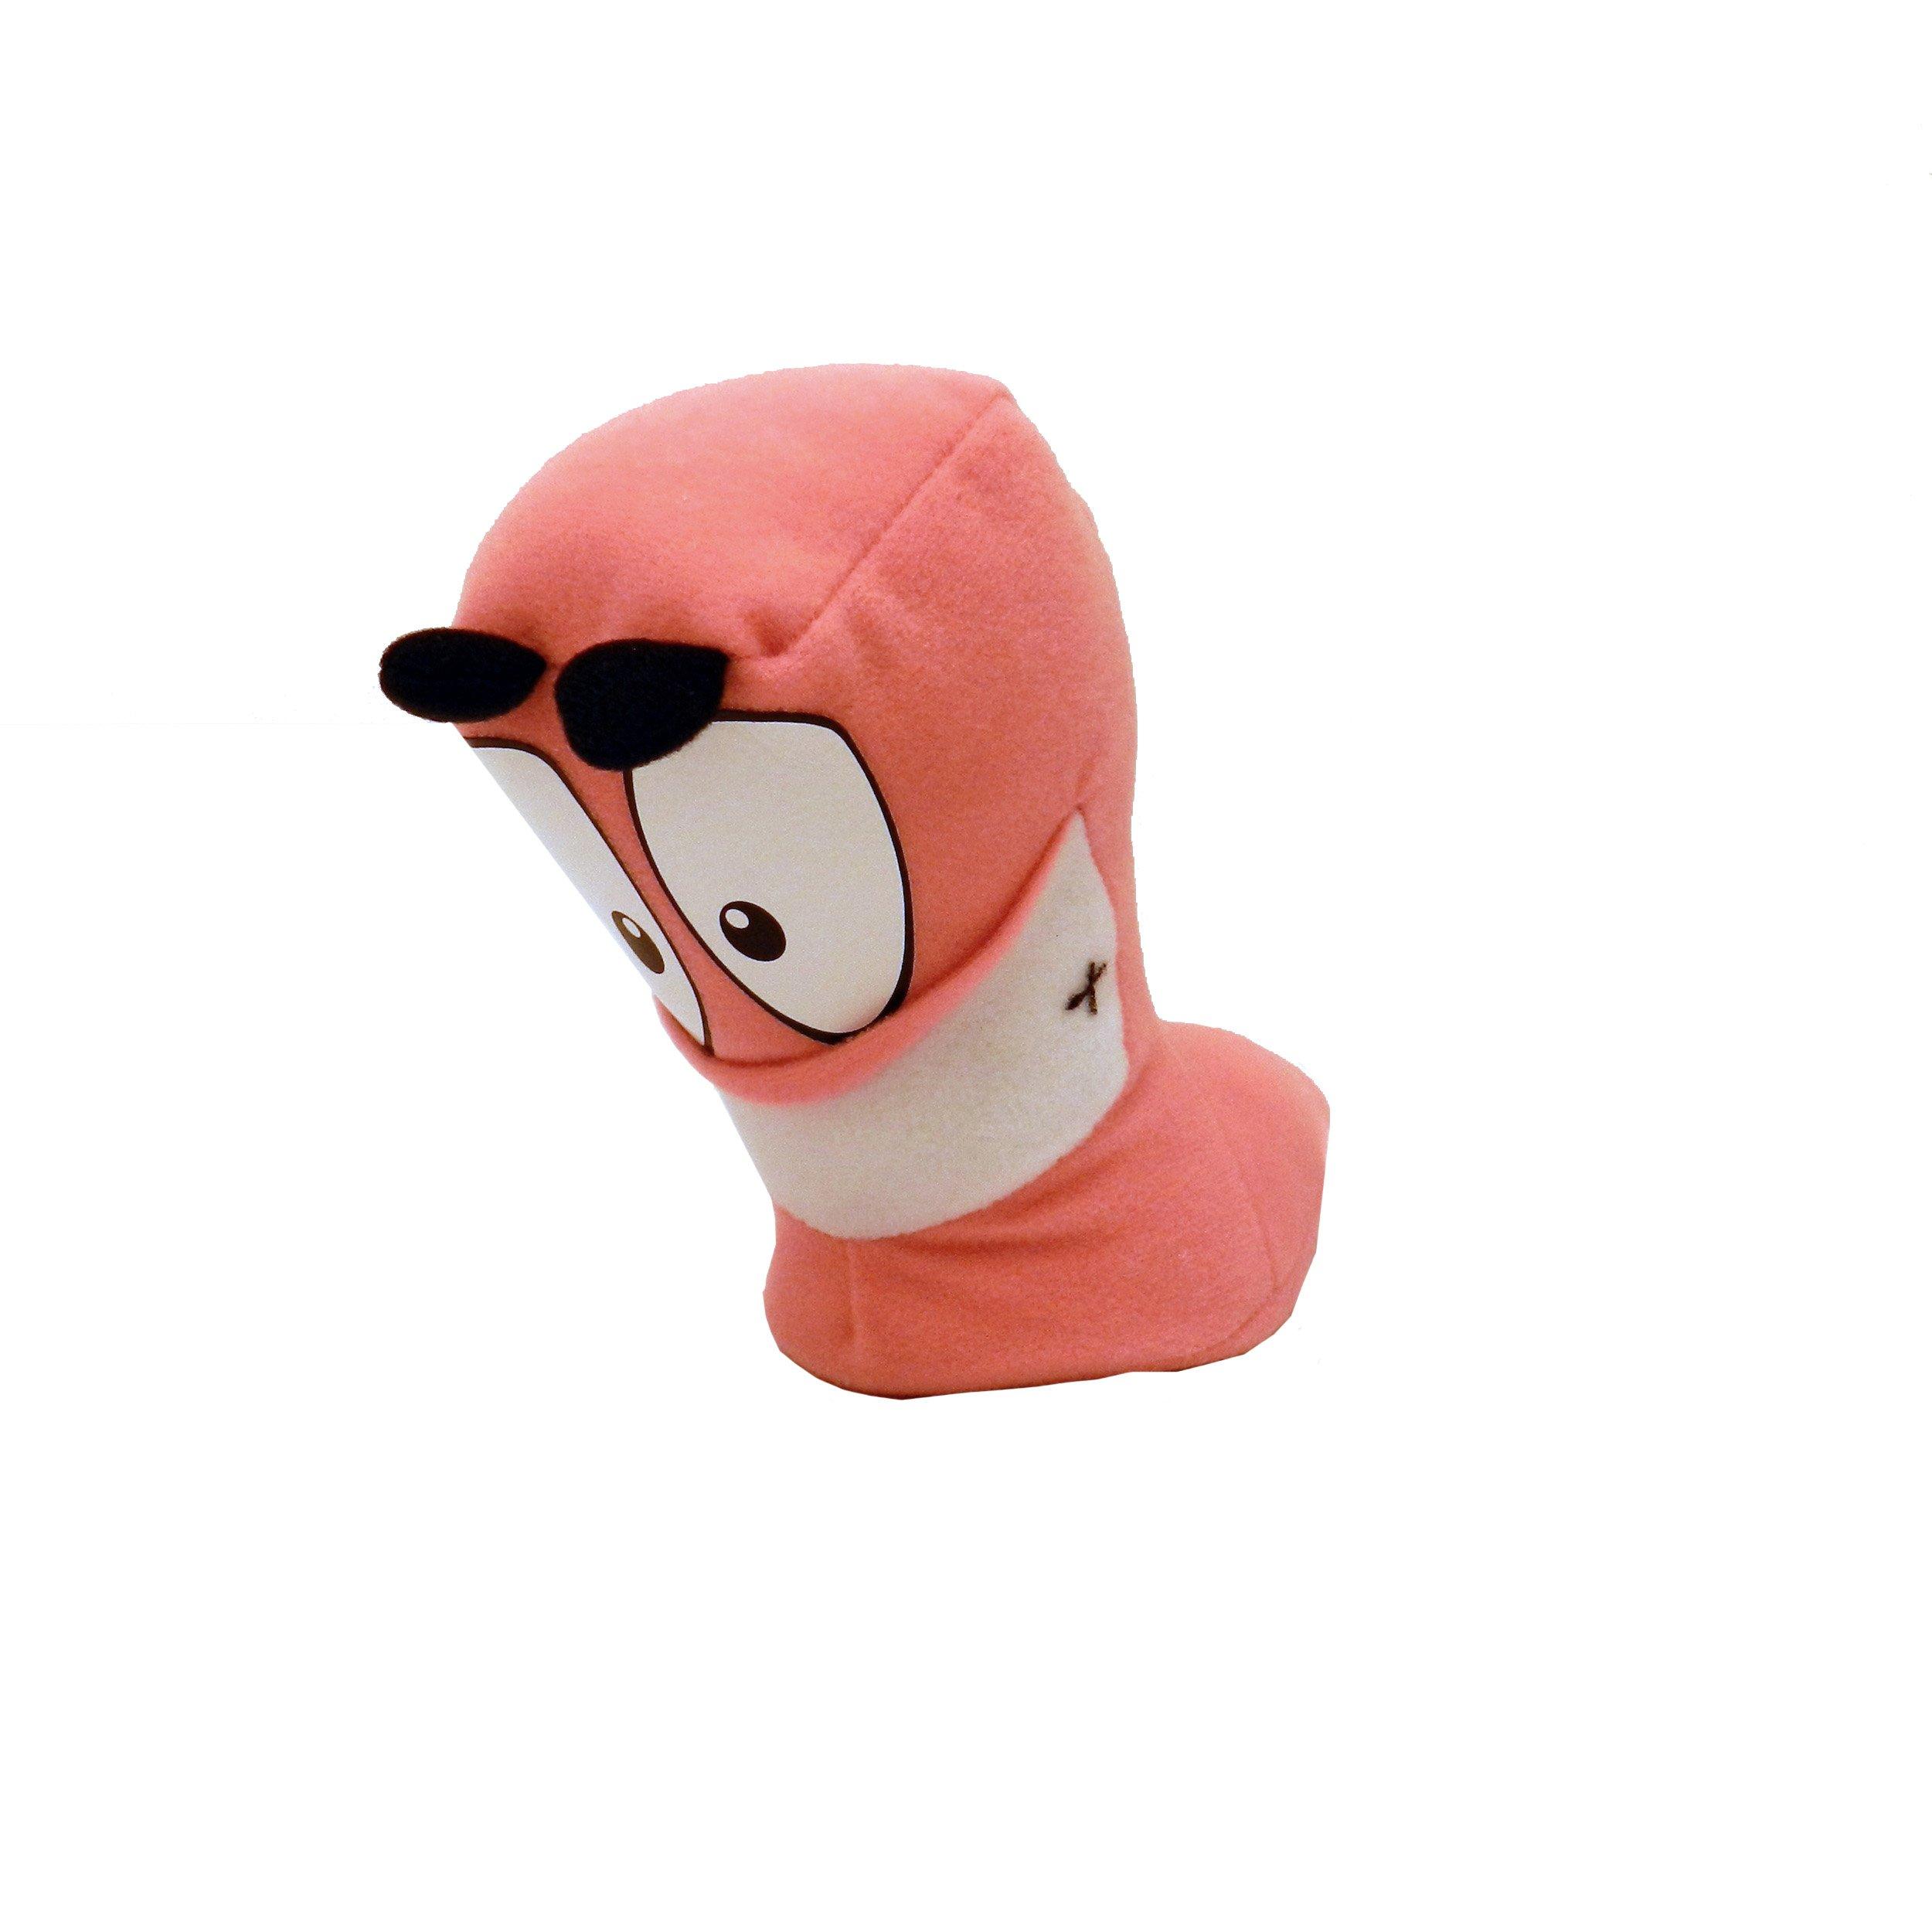 "Worms 6"" Plush"